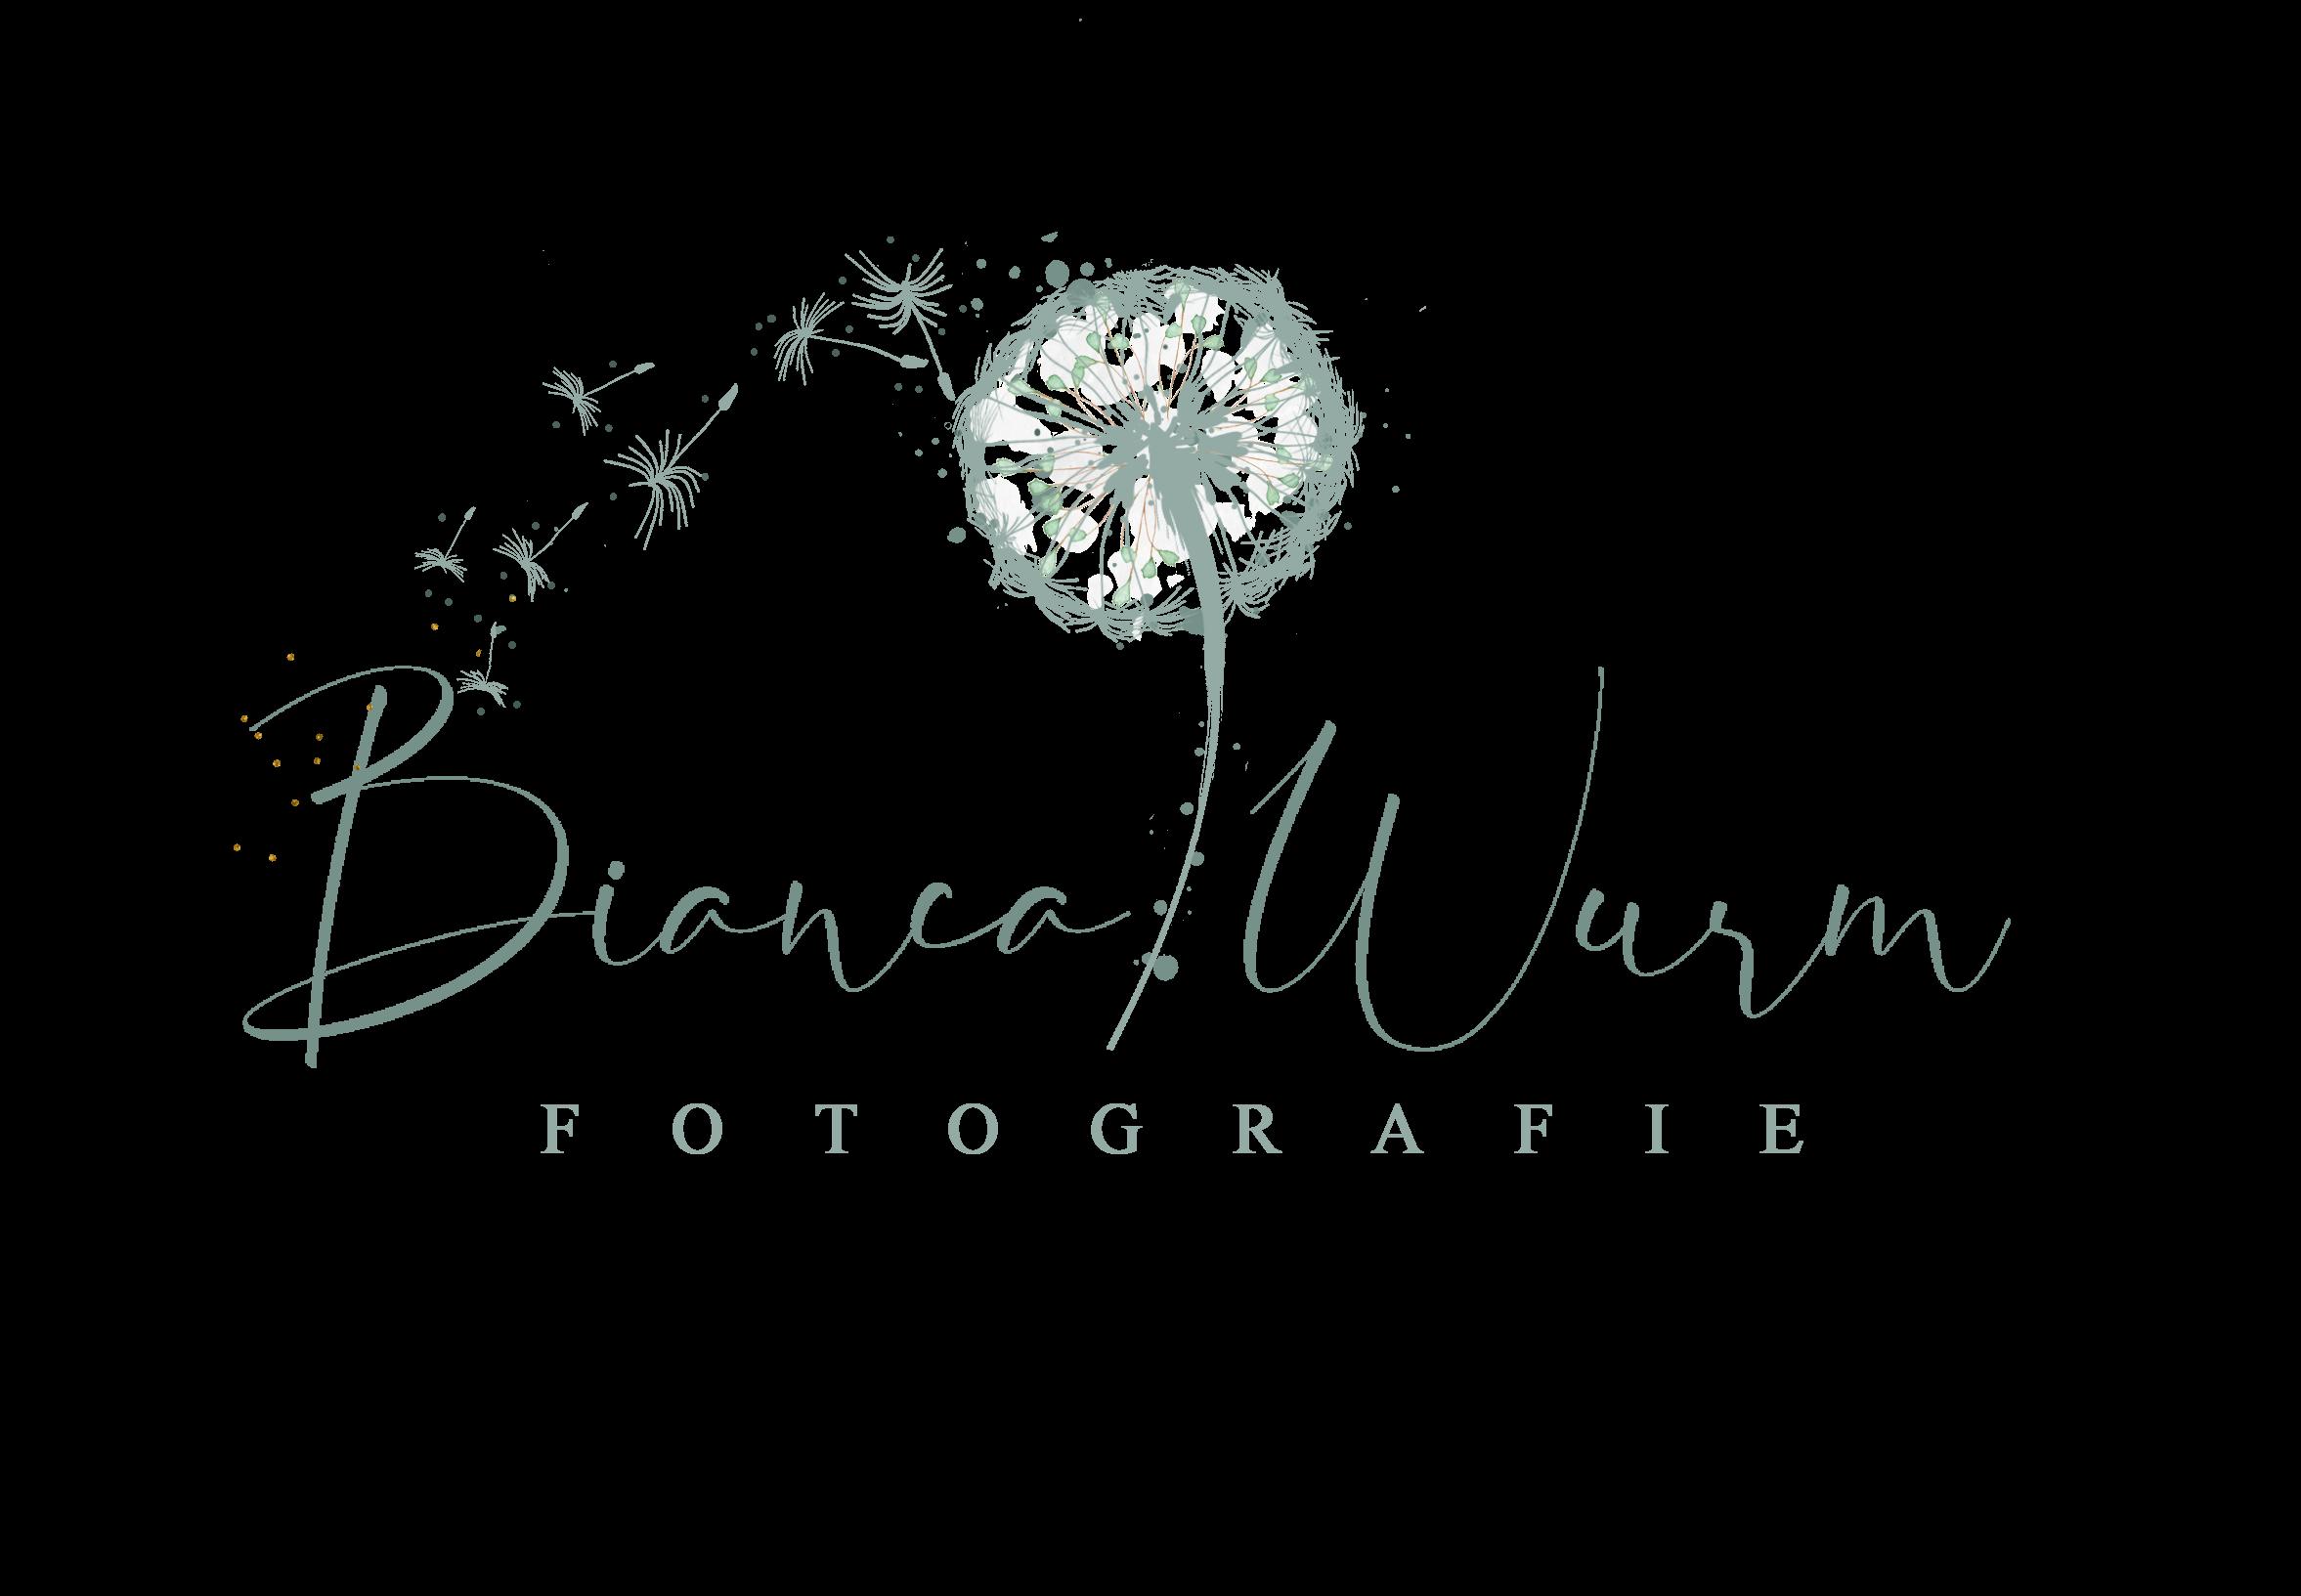 BiancaWurm Fotografie